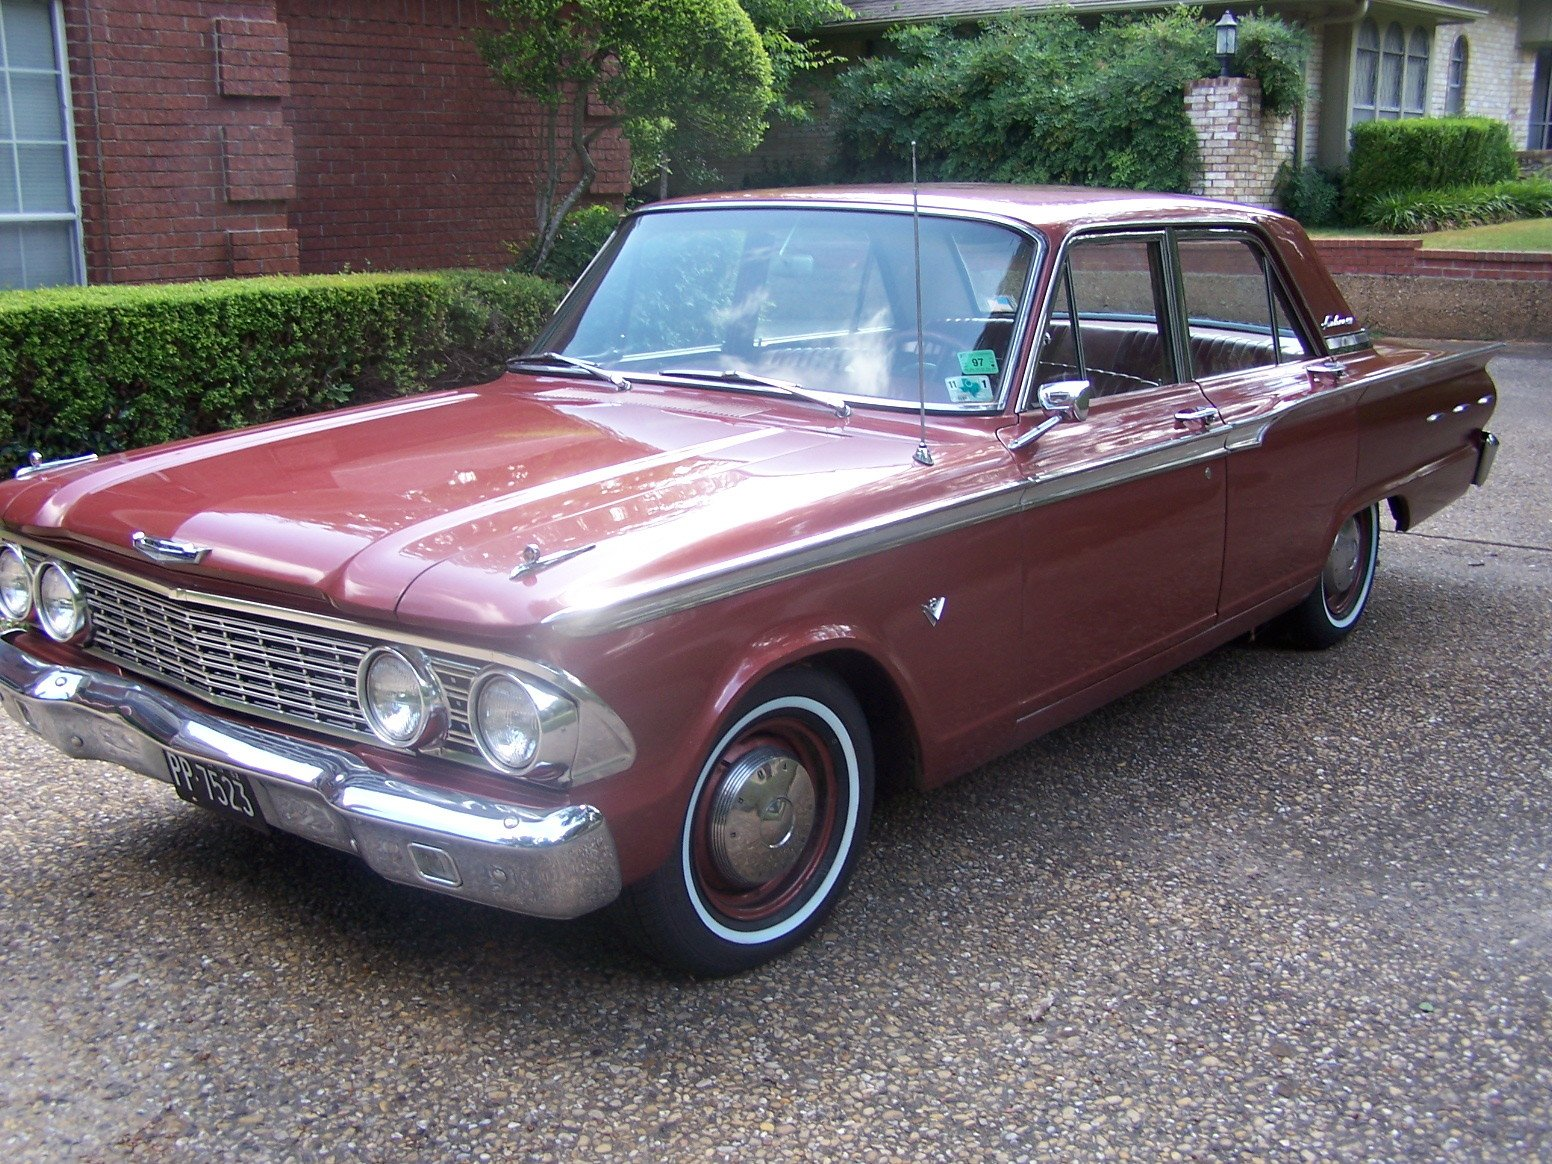 1962 Ford Fairlane & 1955 Ford Fairlane Classics for Sale - Classics on Autotrader markmcfarlin.com